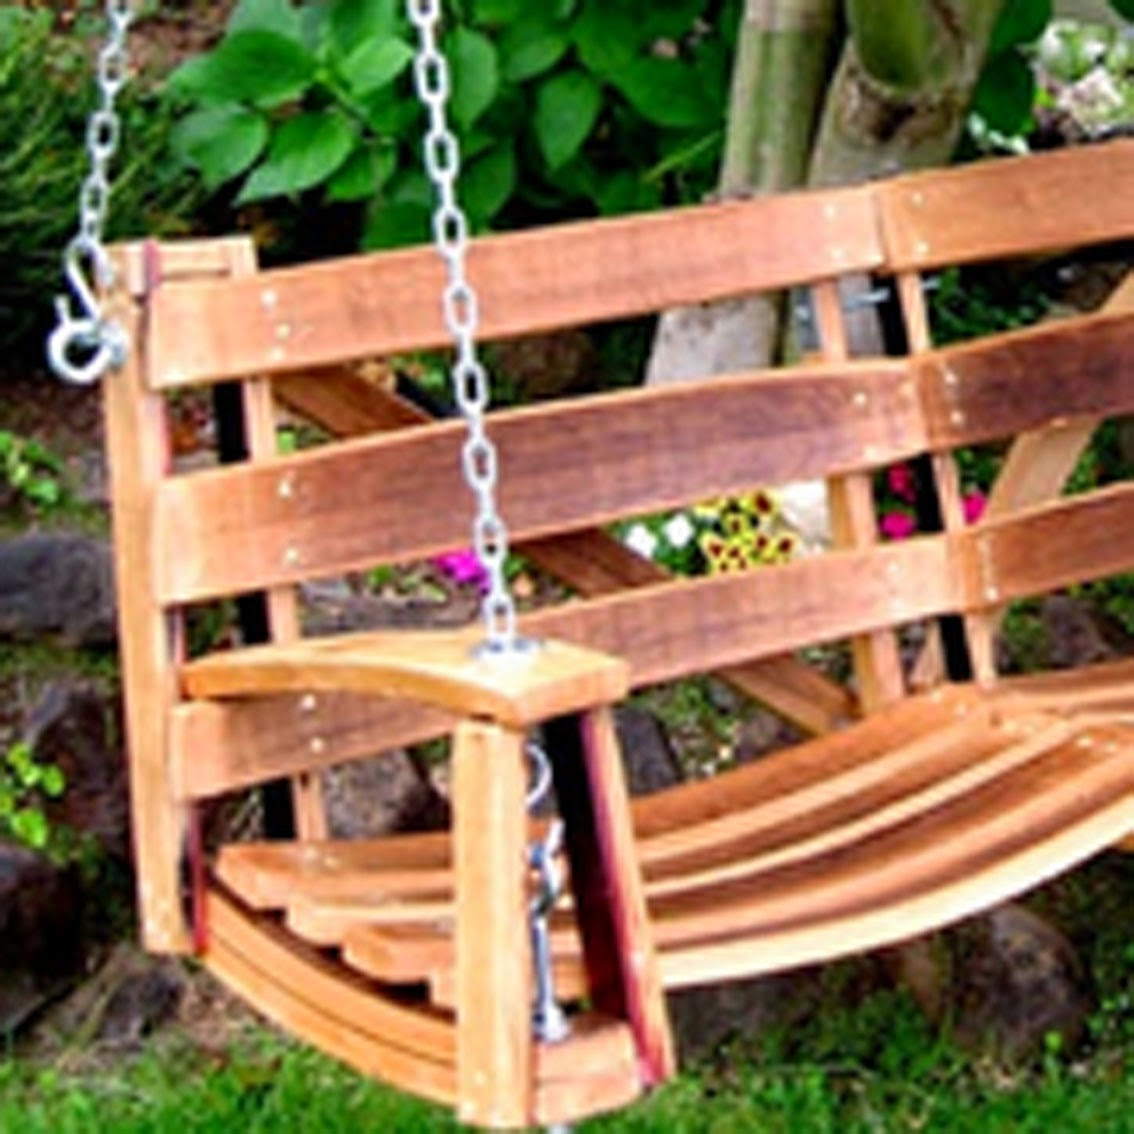 Botte diventa dondolo panchina poltrona da giardino fai for Laghetti da giardino fai da te